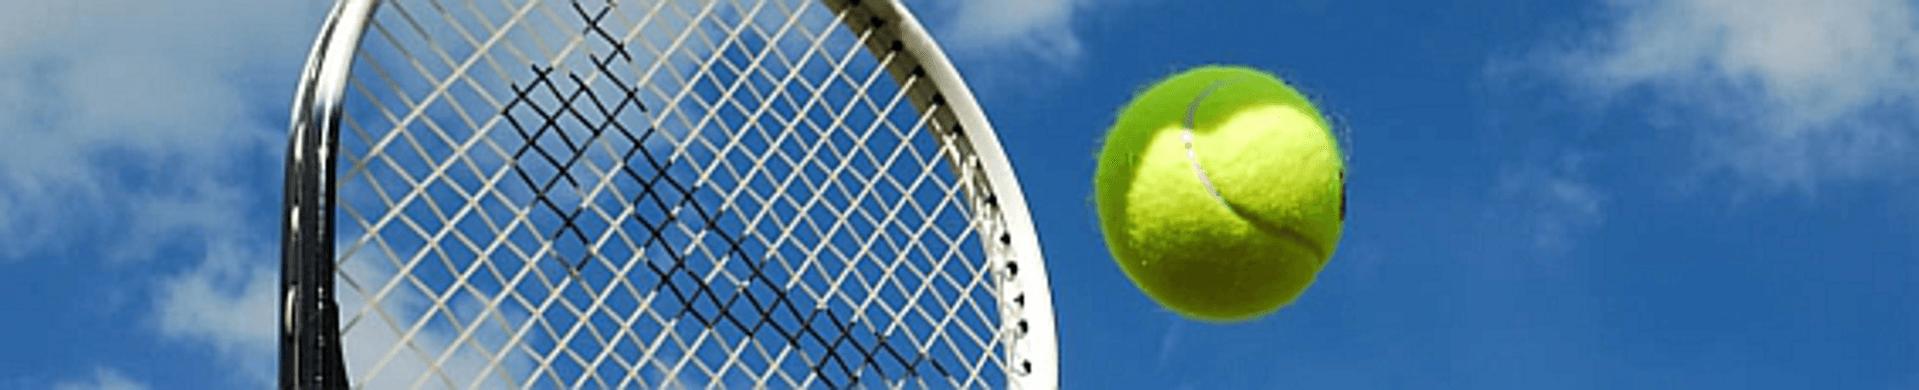 06-racket-met-bal-1919x390px-v4